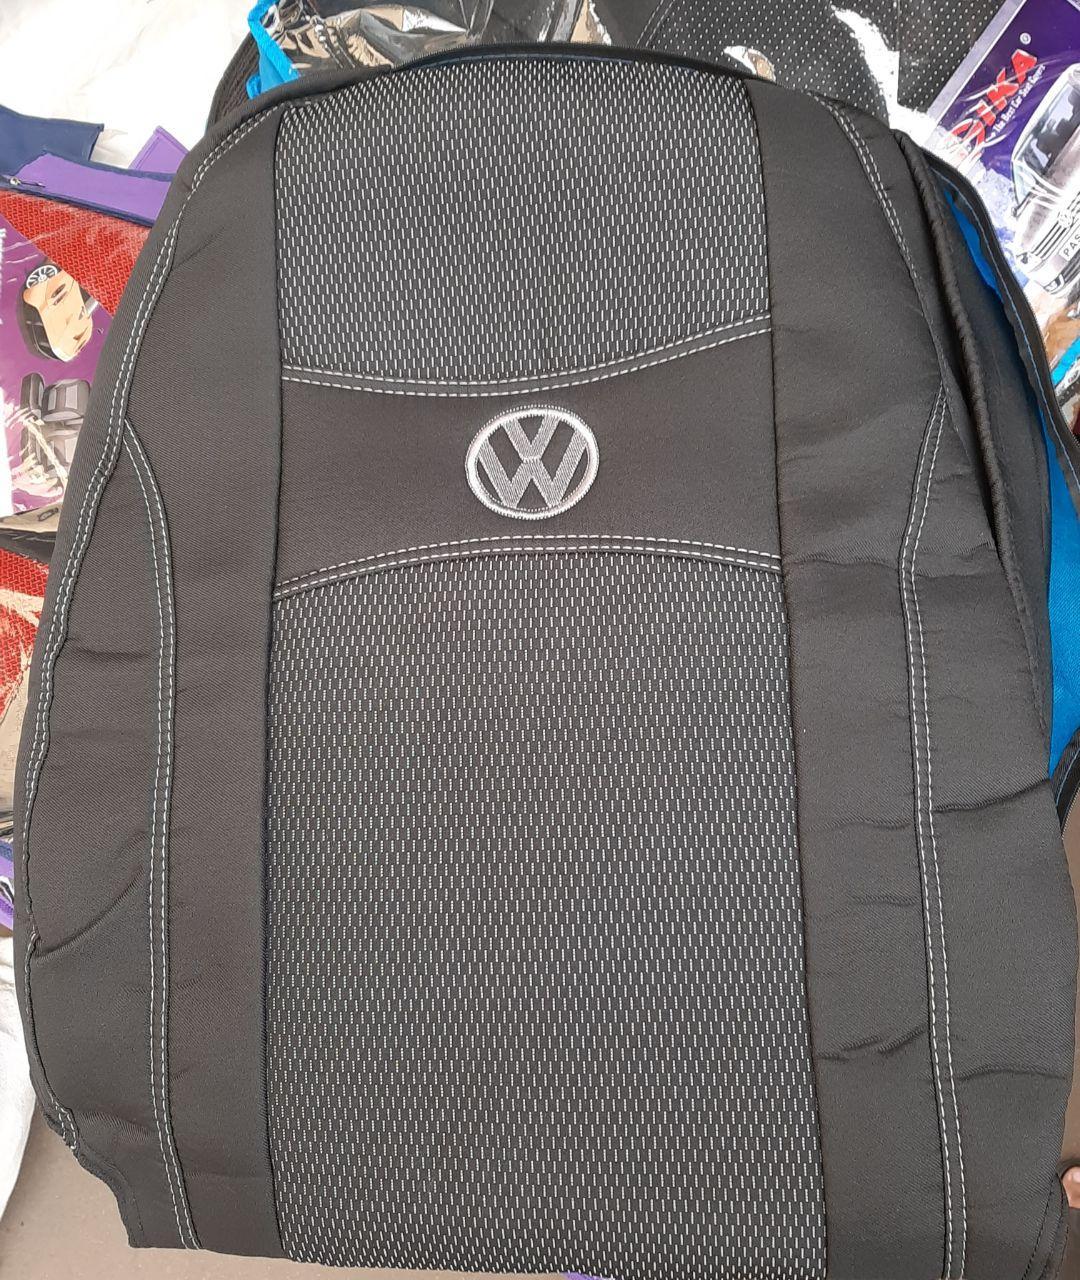 Чехлы на Фольксваген Пассат Б6 2005-2010 (универсал) / авто чехлы Volkswagen Passat B6 (Nika)